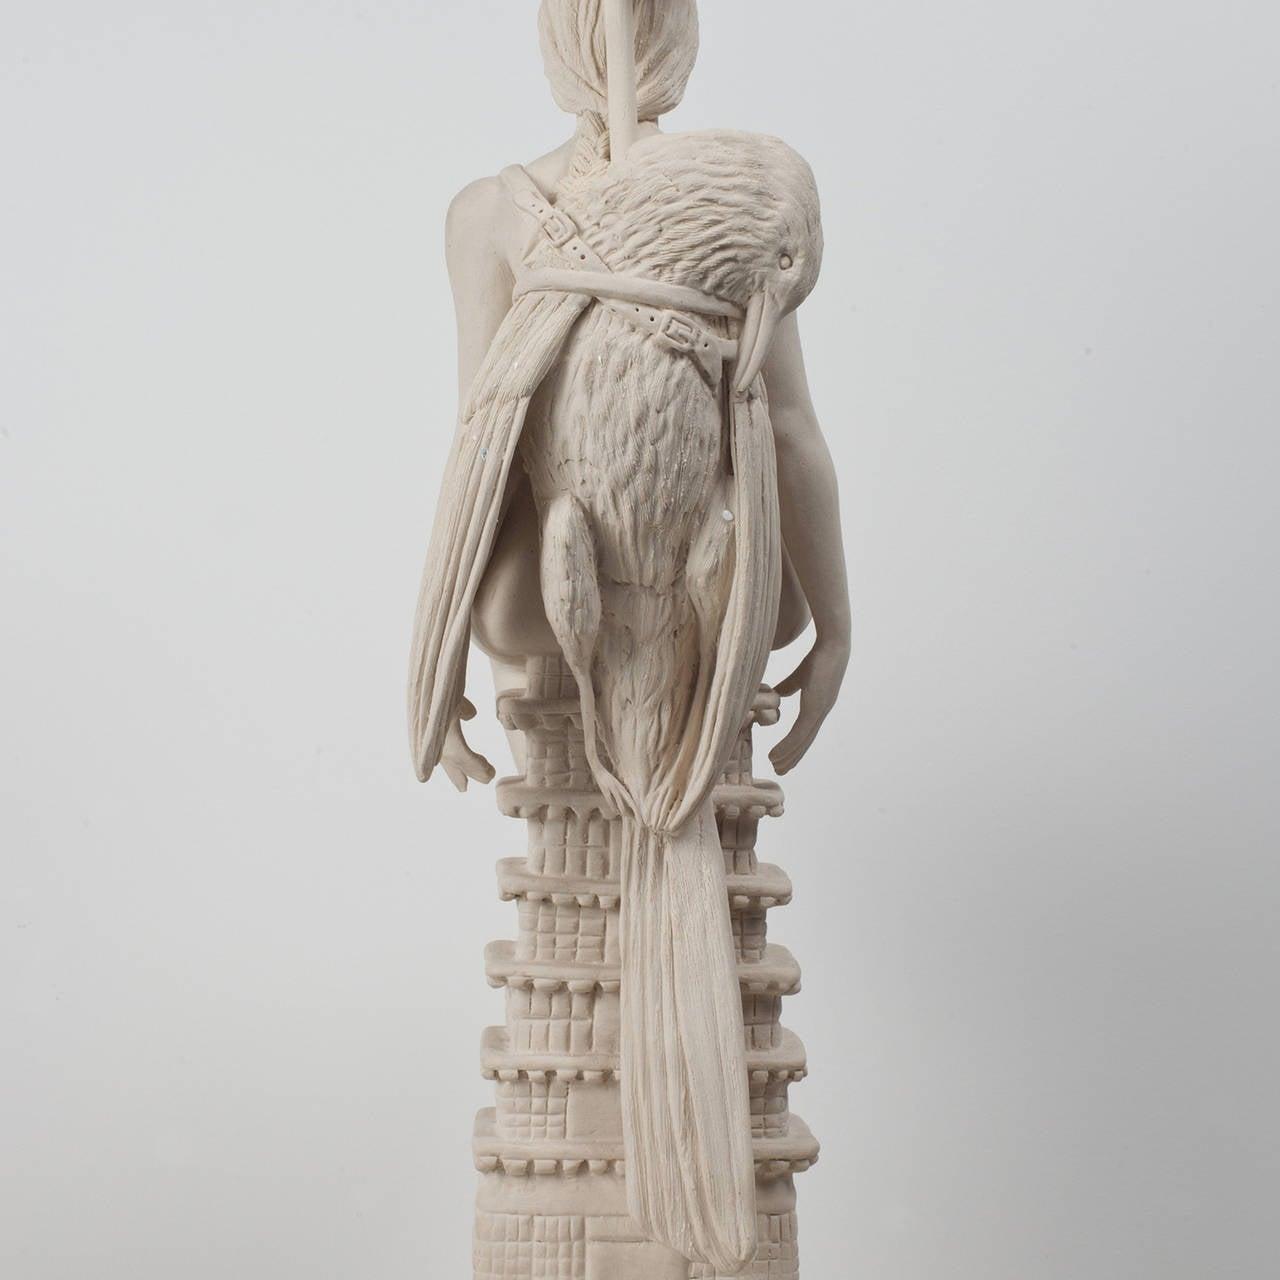 She Bird Temple - Conceptual Sculpture by Tricia Cline